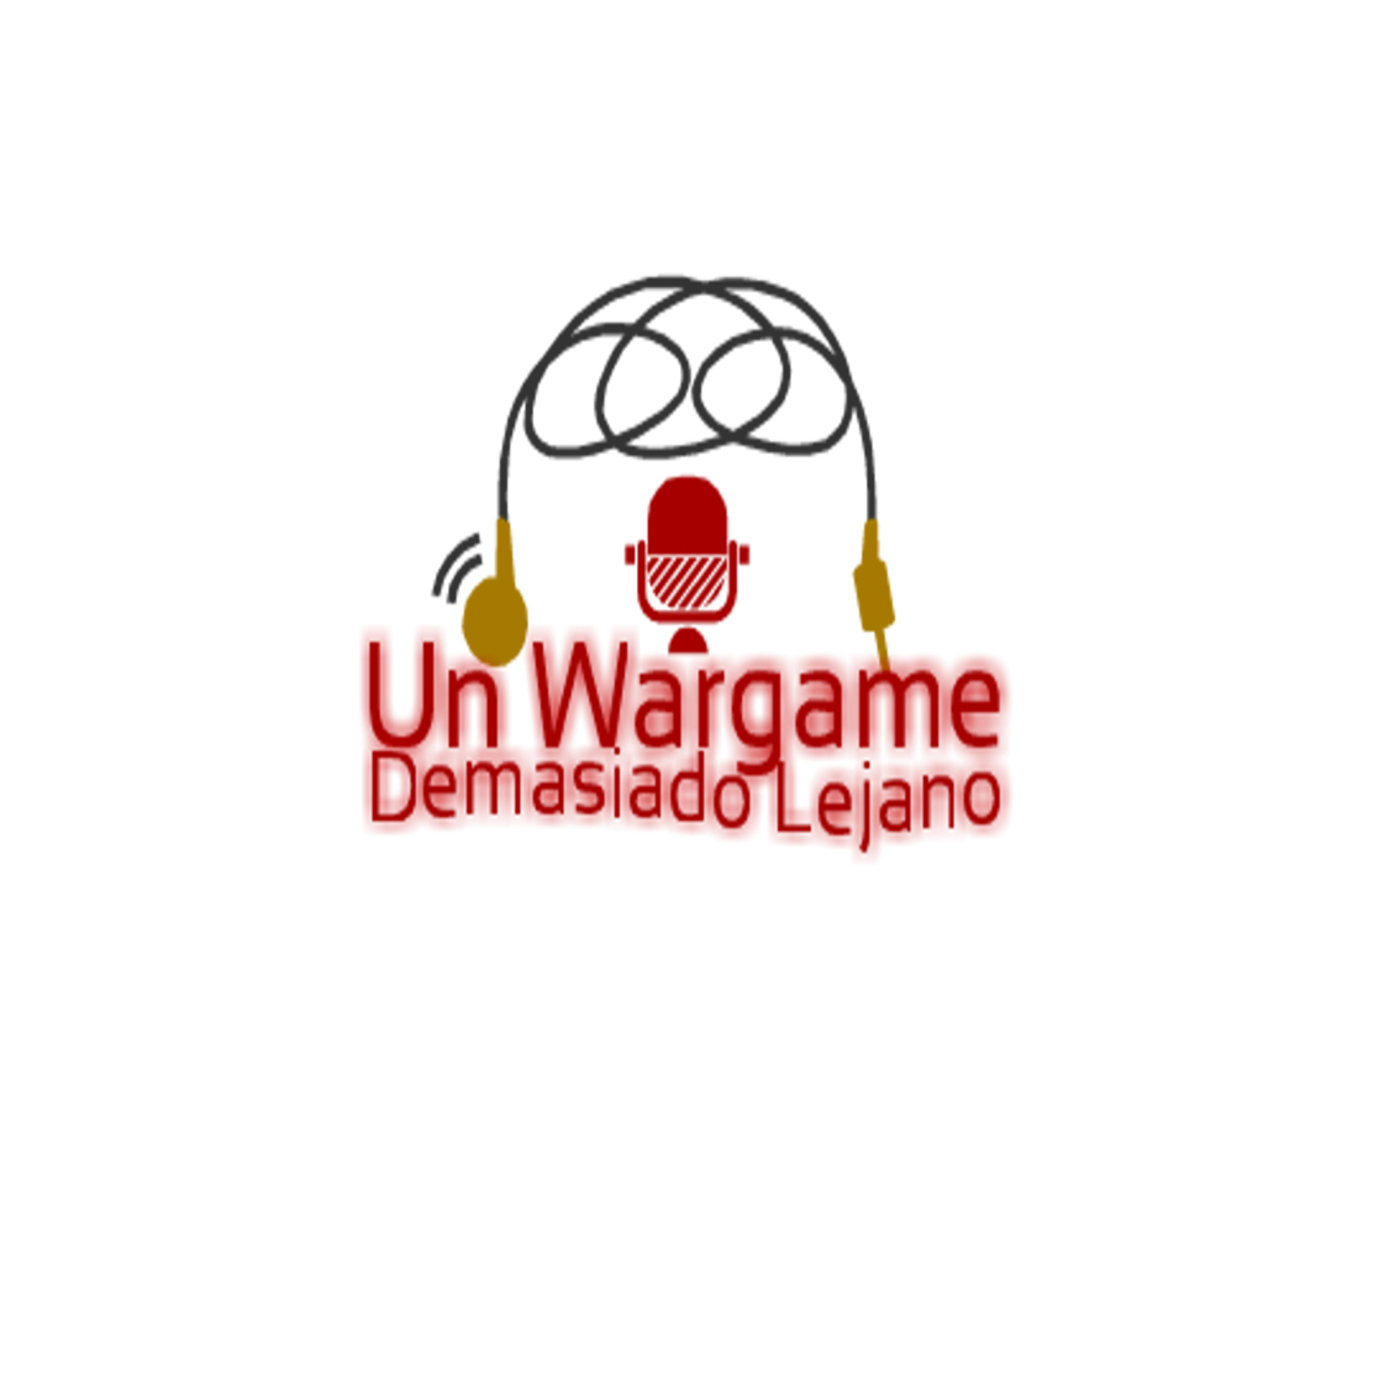 <![CDATA[Un Wargame Demasiado Lejano]]>